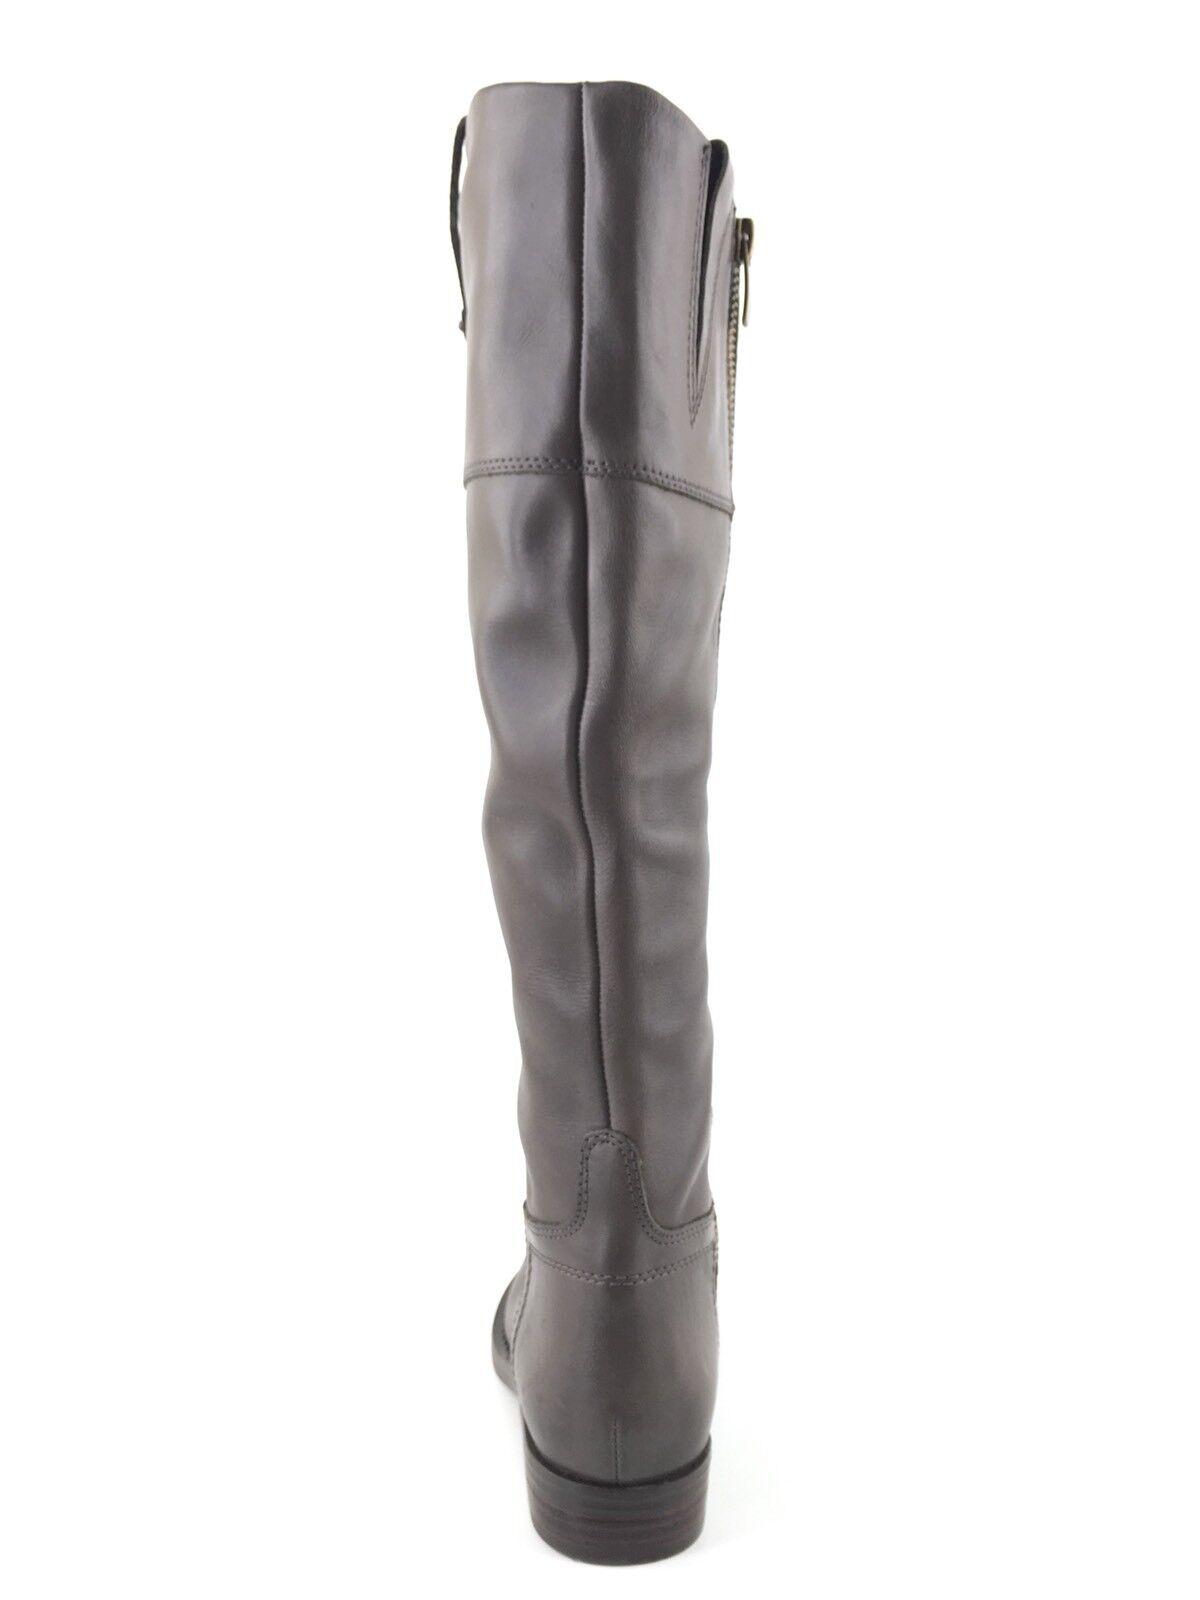 Enzo Angiolini Angiolini Angiolini Ellerby Gray Knee High Riding Stiefel Damens's Größe 4.5 M  02126a